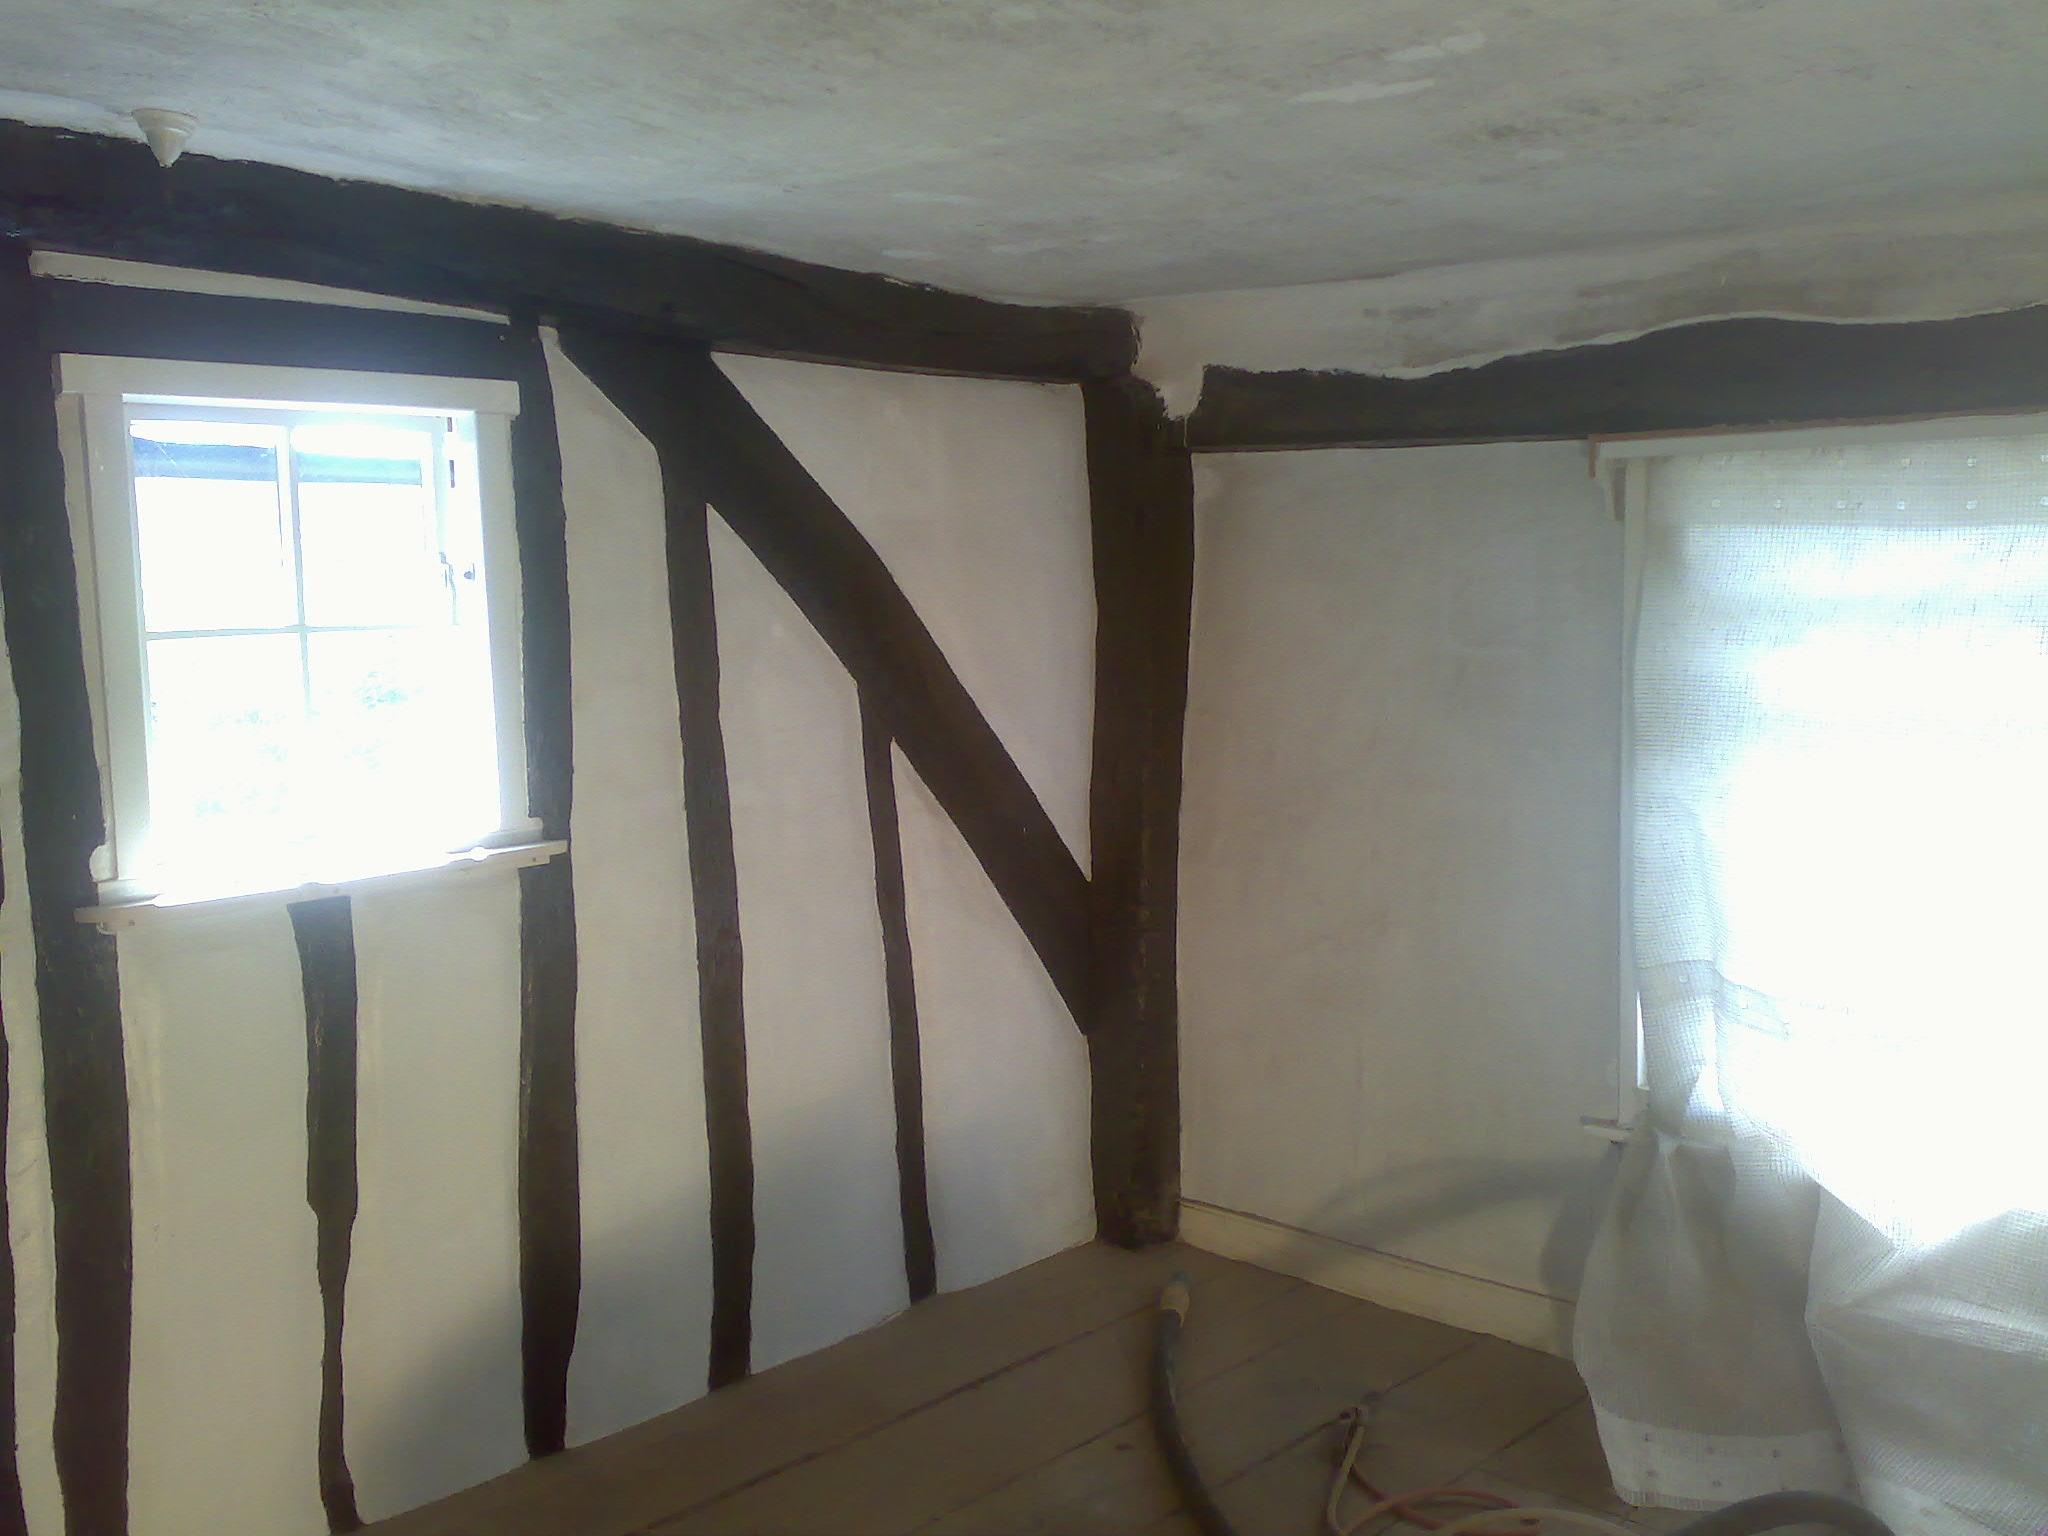 More Beams 1 - Wood